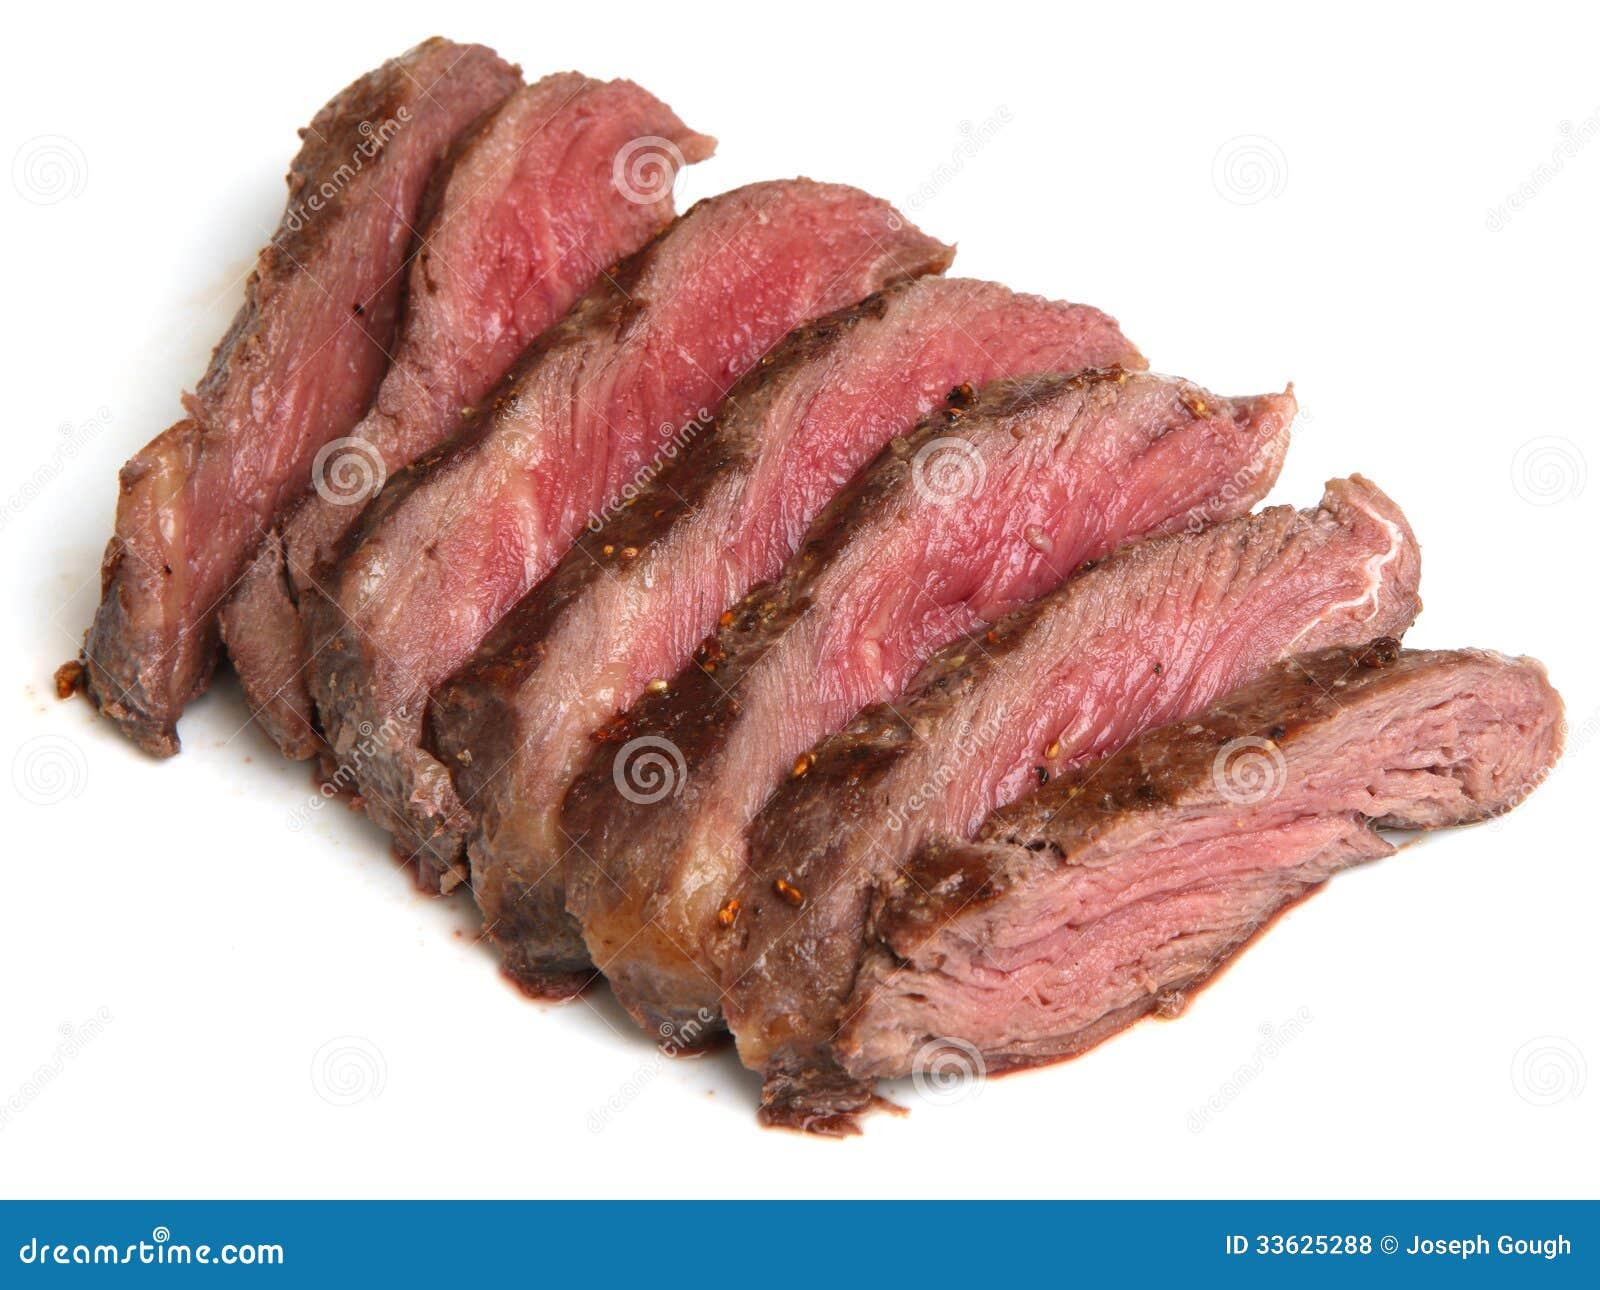 Rare Beef Fillet Steak Sliced On White Background Royalty